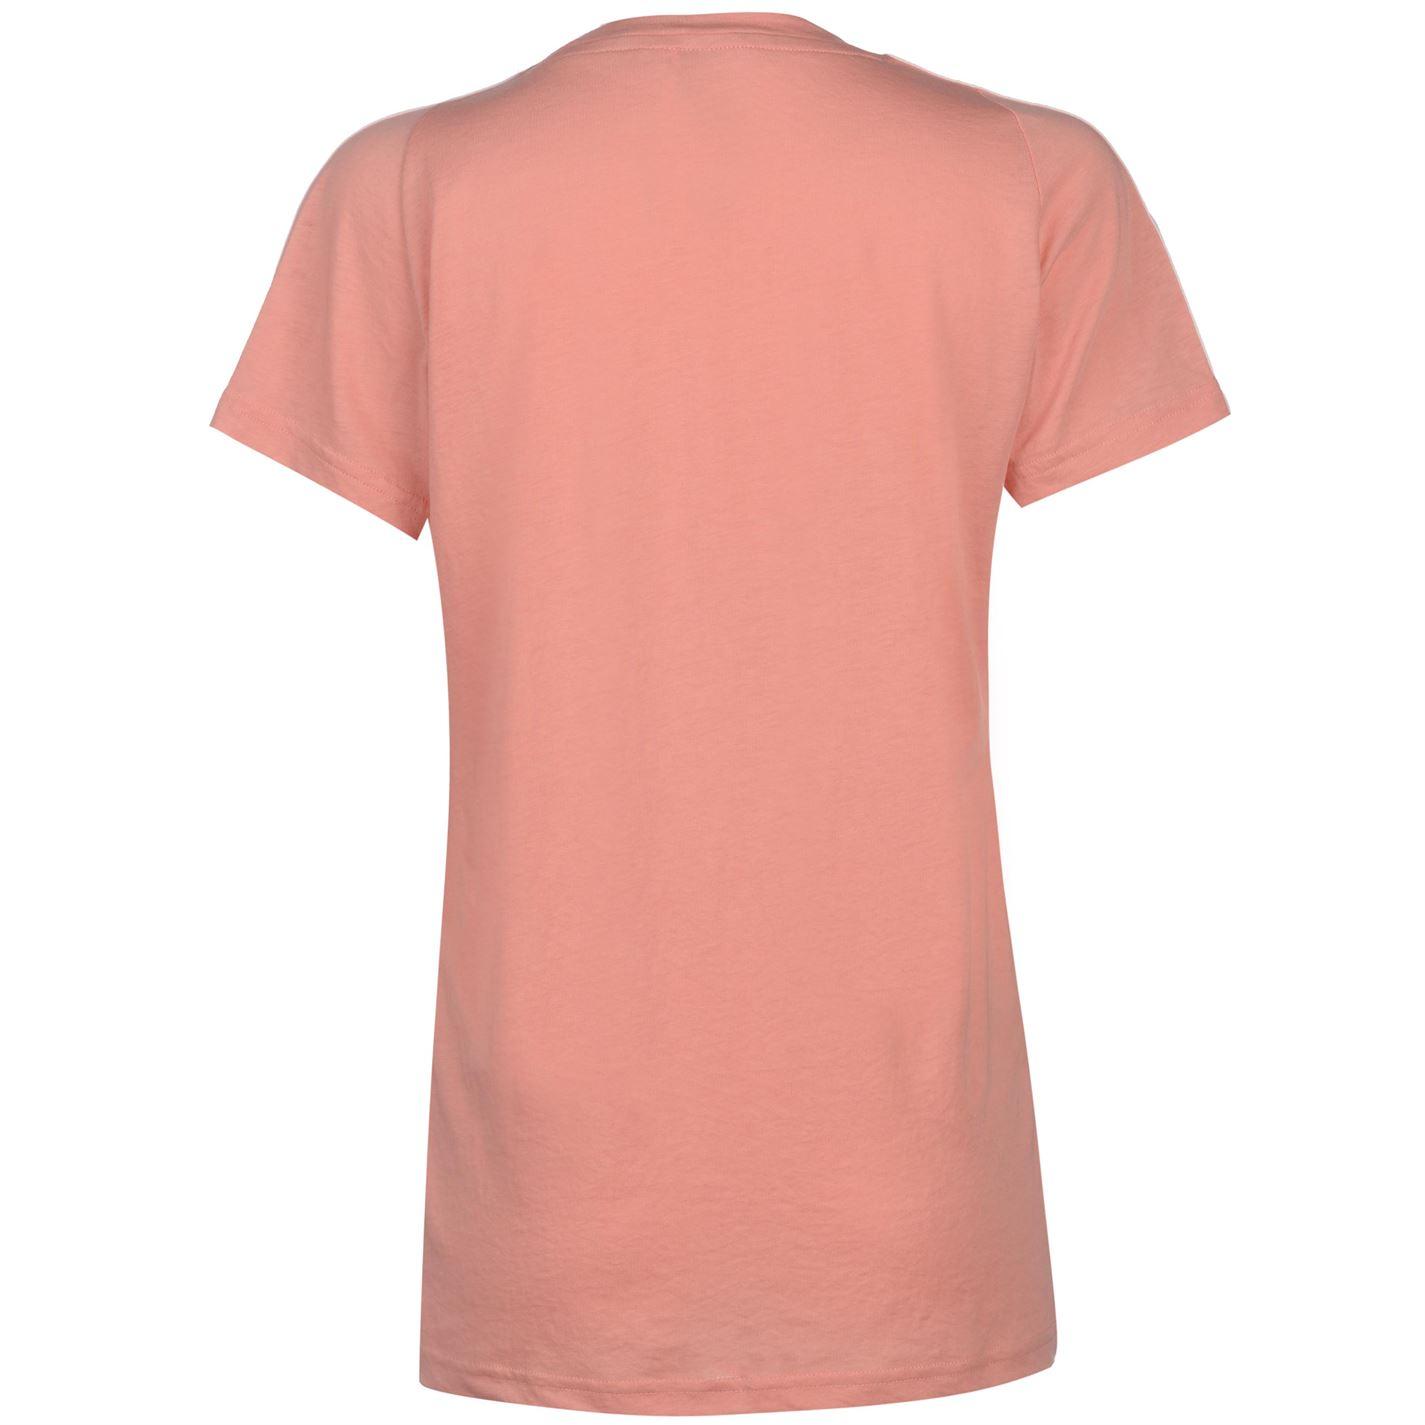 8ee87d7c063147 adidas Womens Essentials 3 Stripe T Shirt Crew Neck Tee Top Short ...